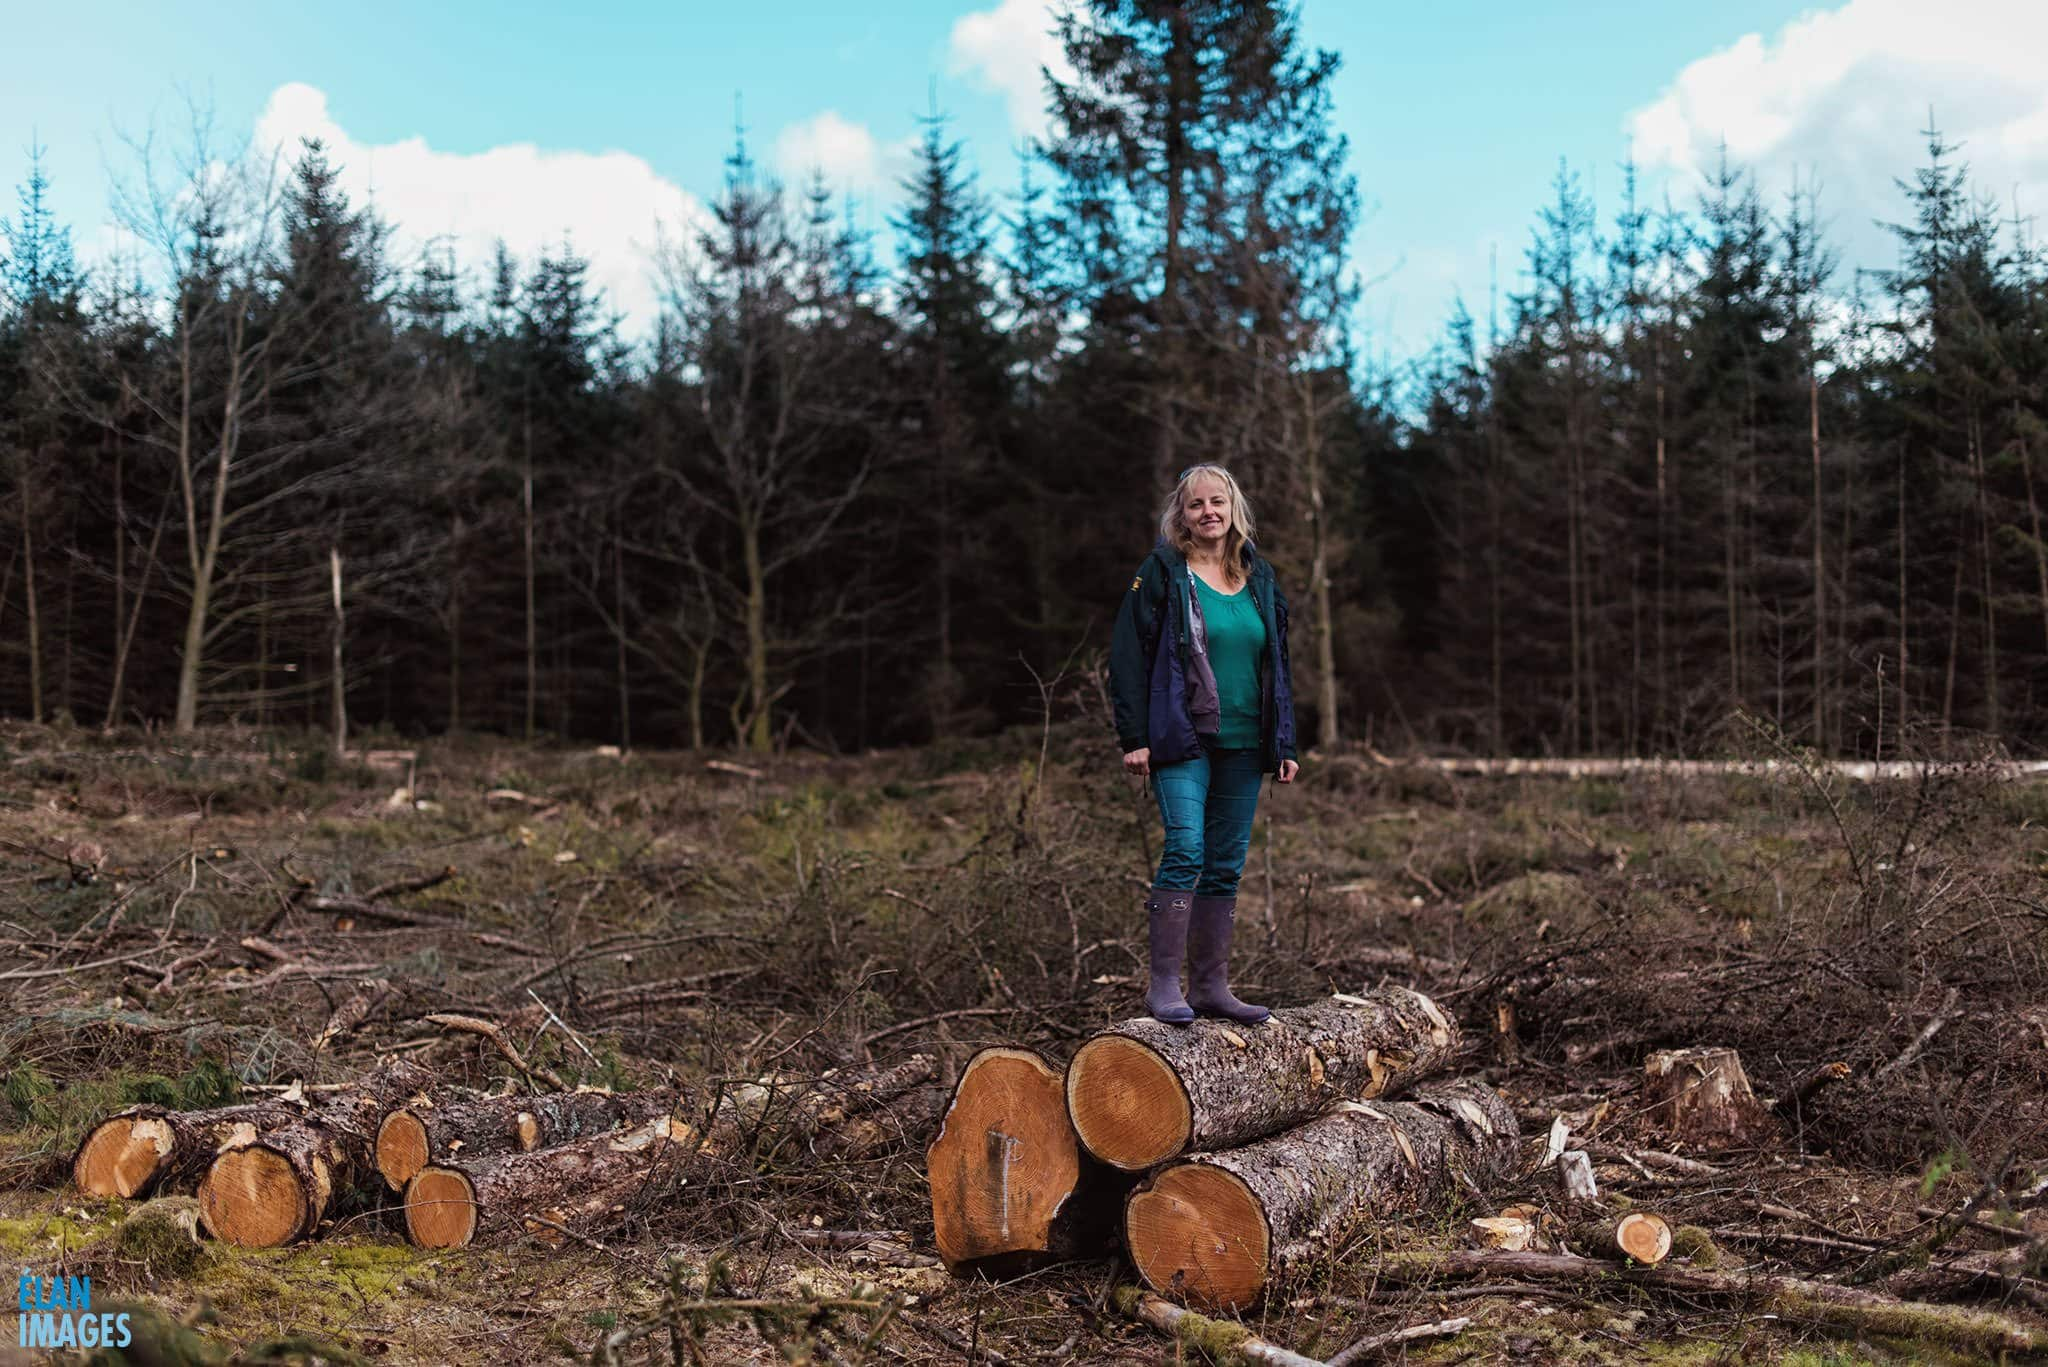 woodland film photo shoot with Nikon F2 camera